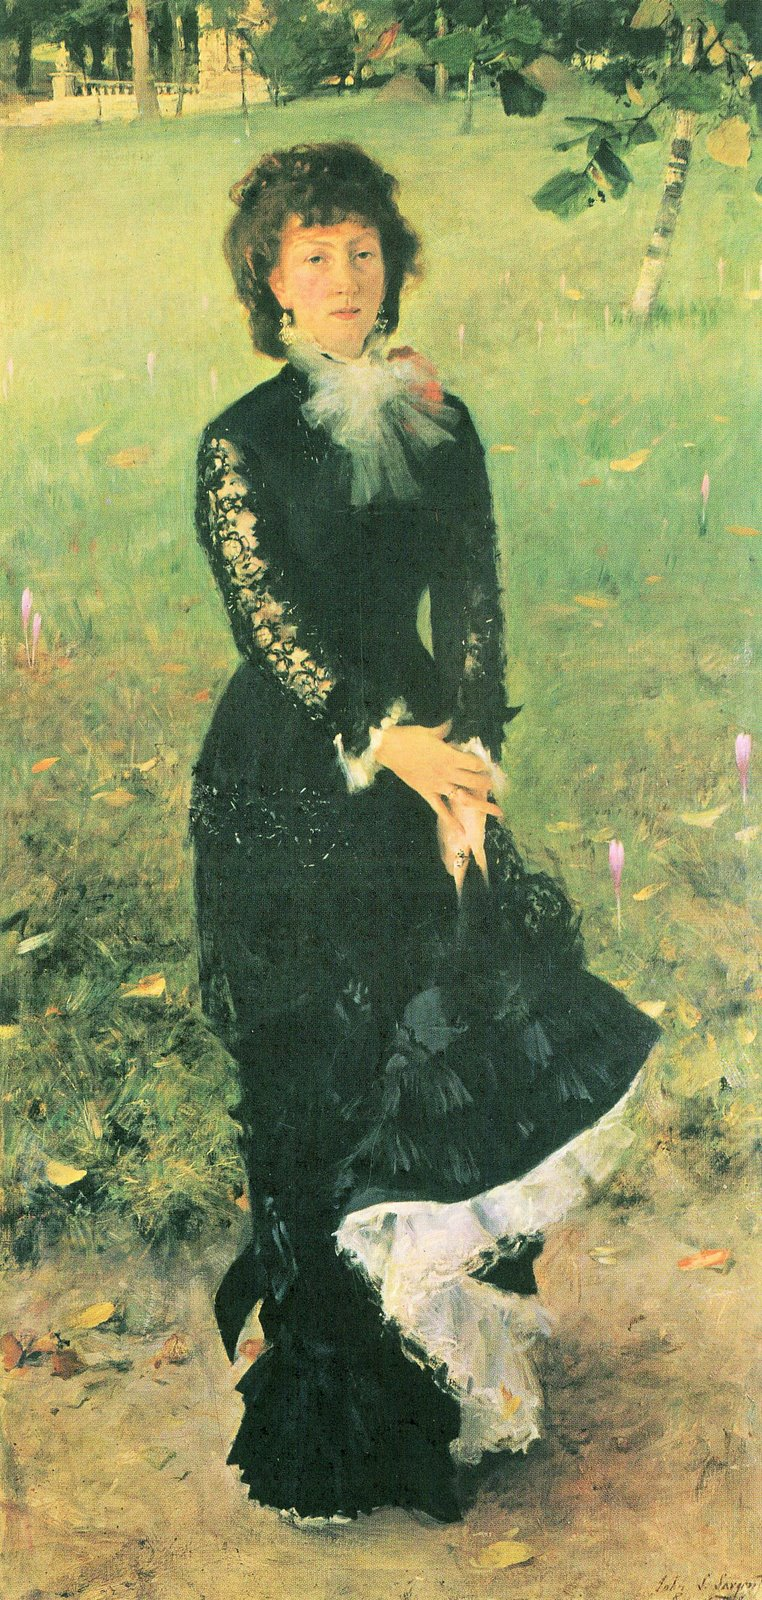 Madame Edouard Pailleron by John Singer Sargent, 1879